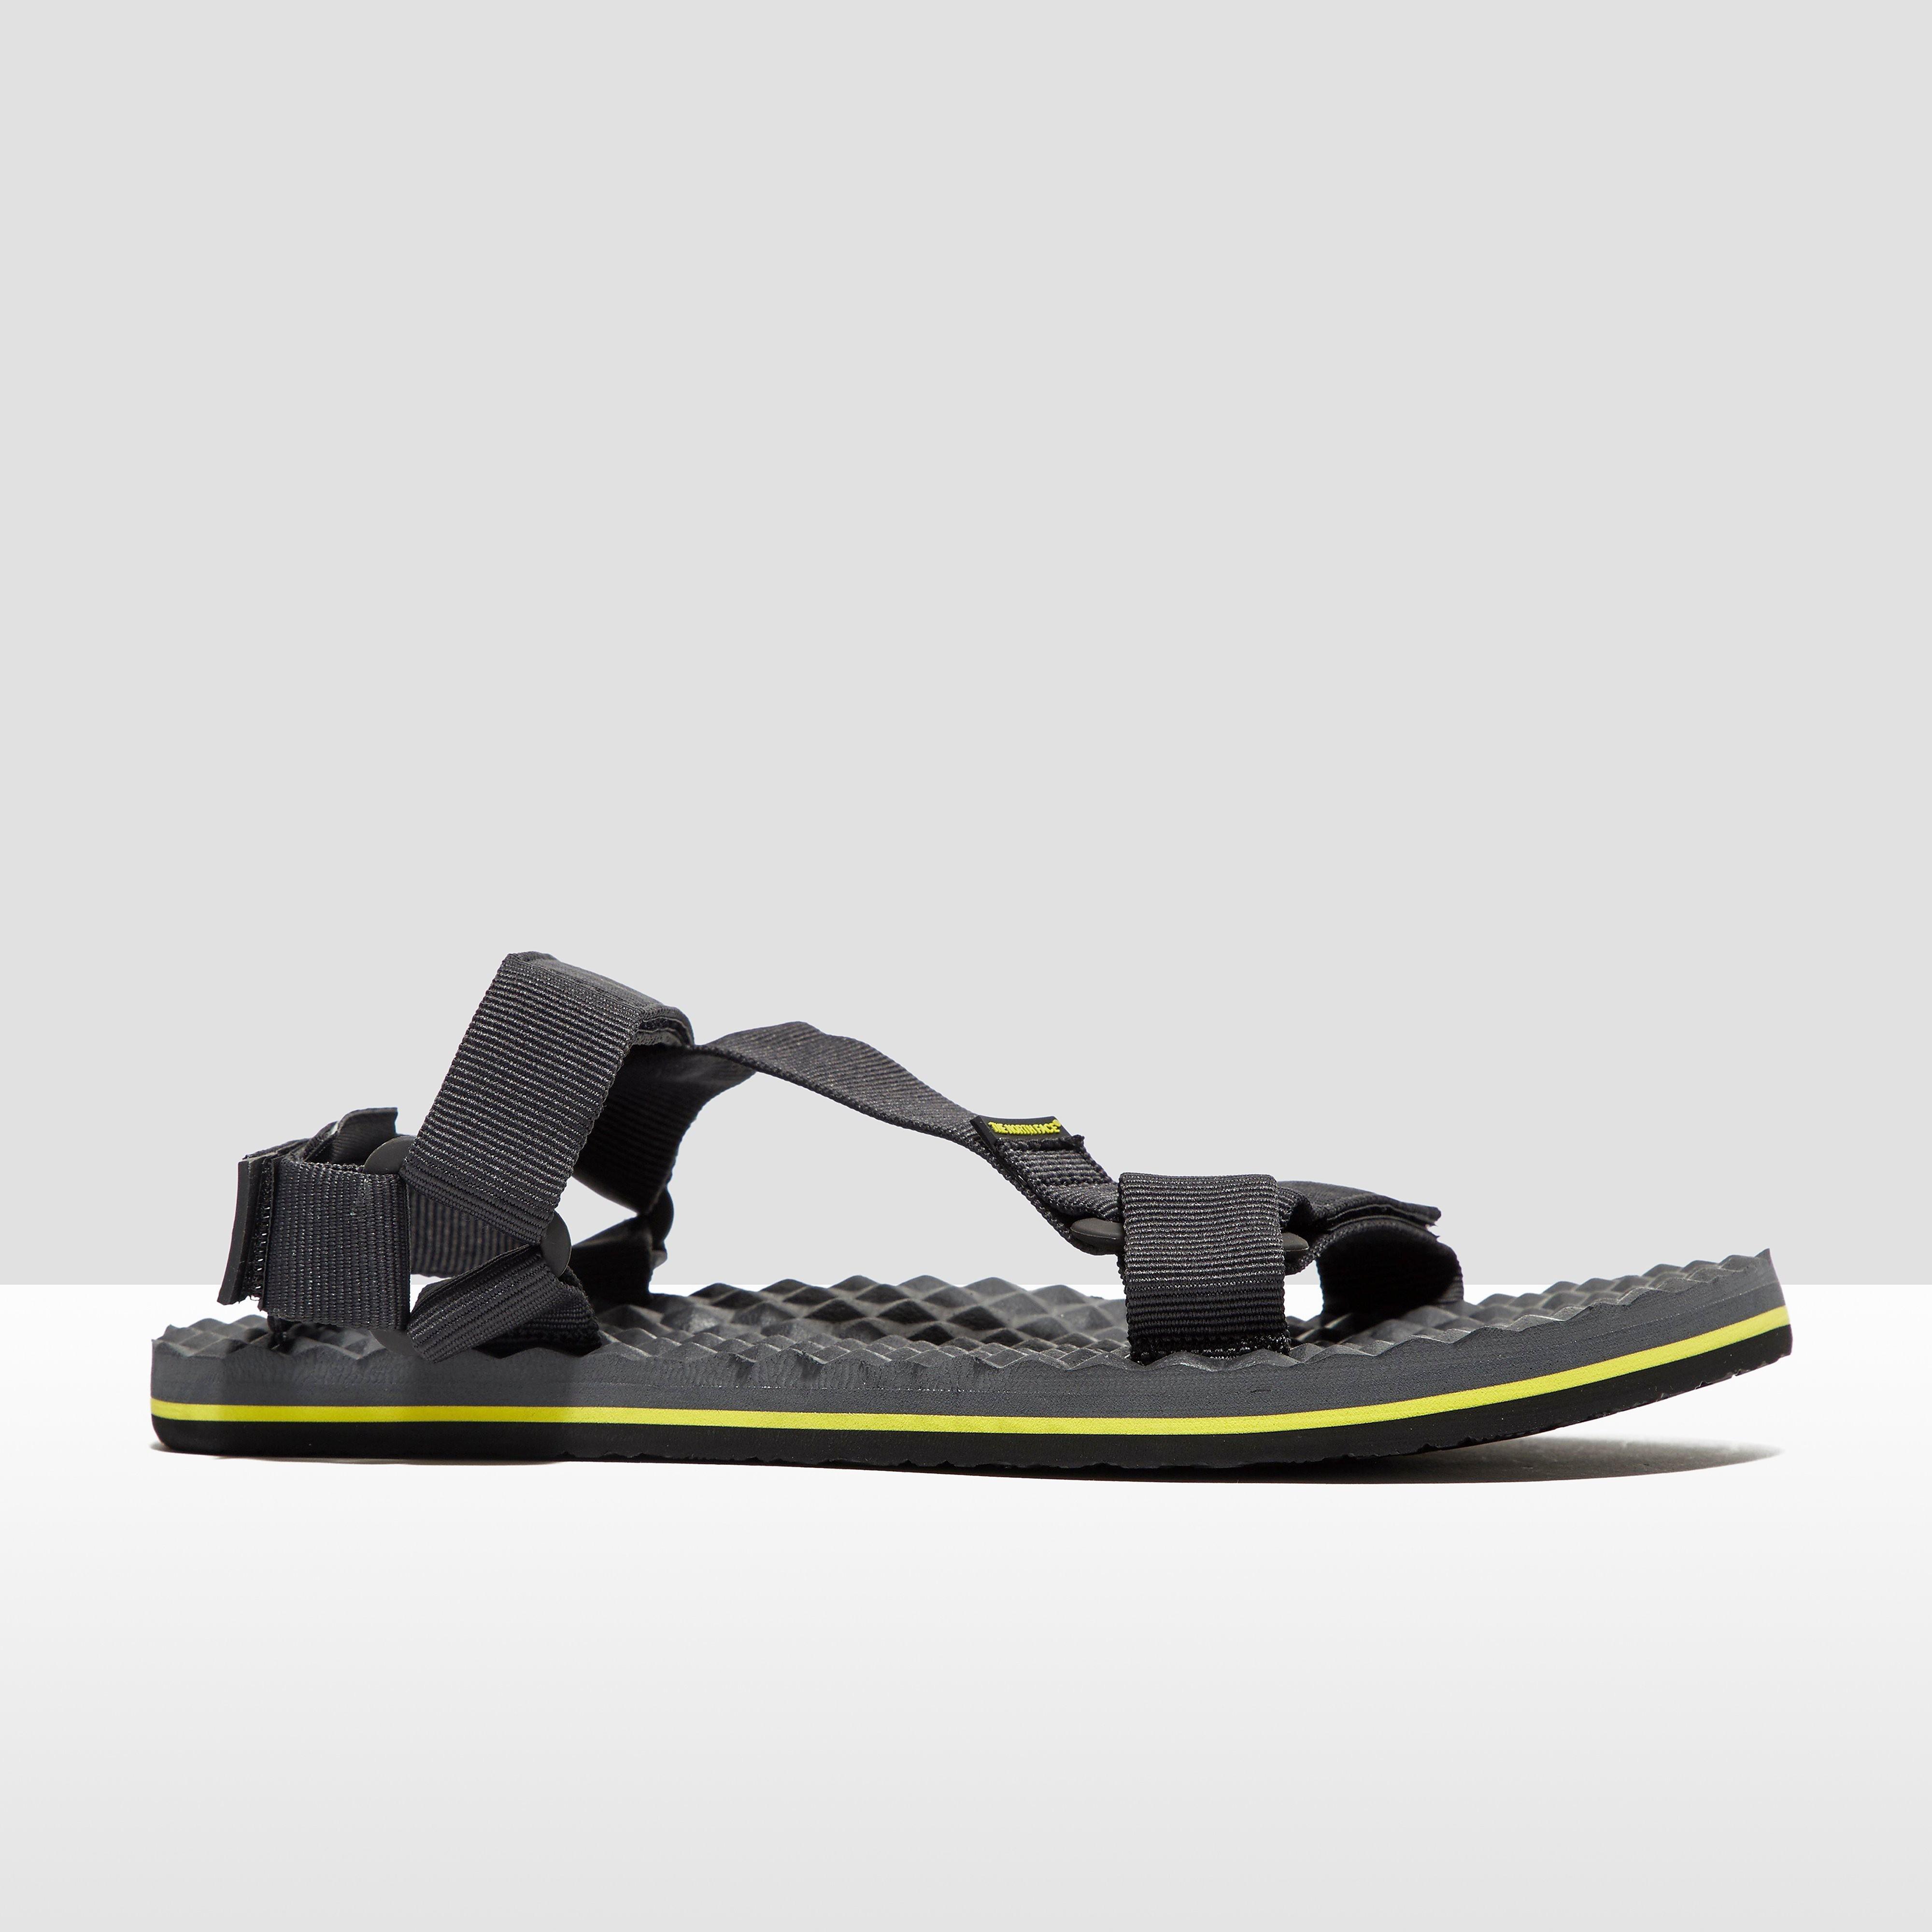 The North Face Base Camp Switchback Men's Sandals